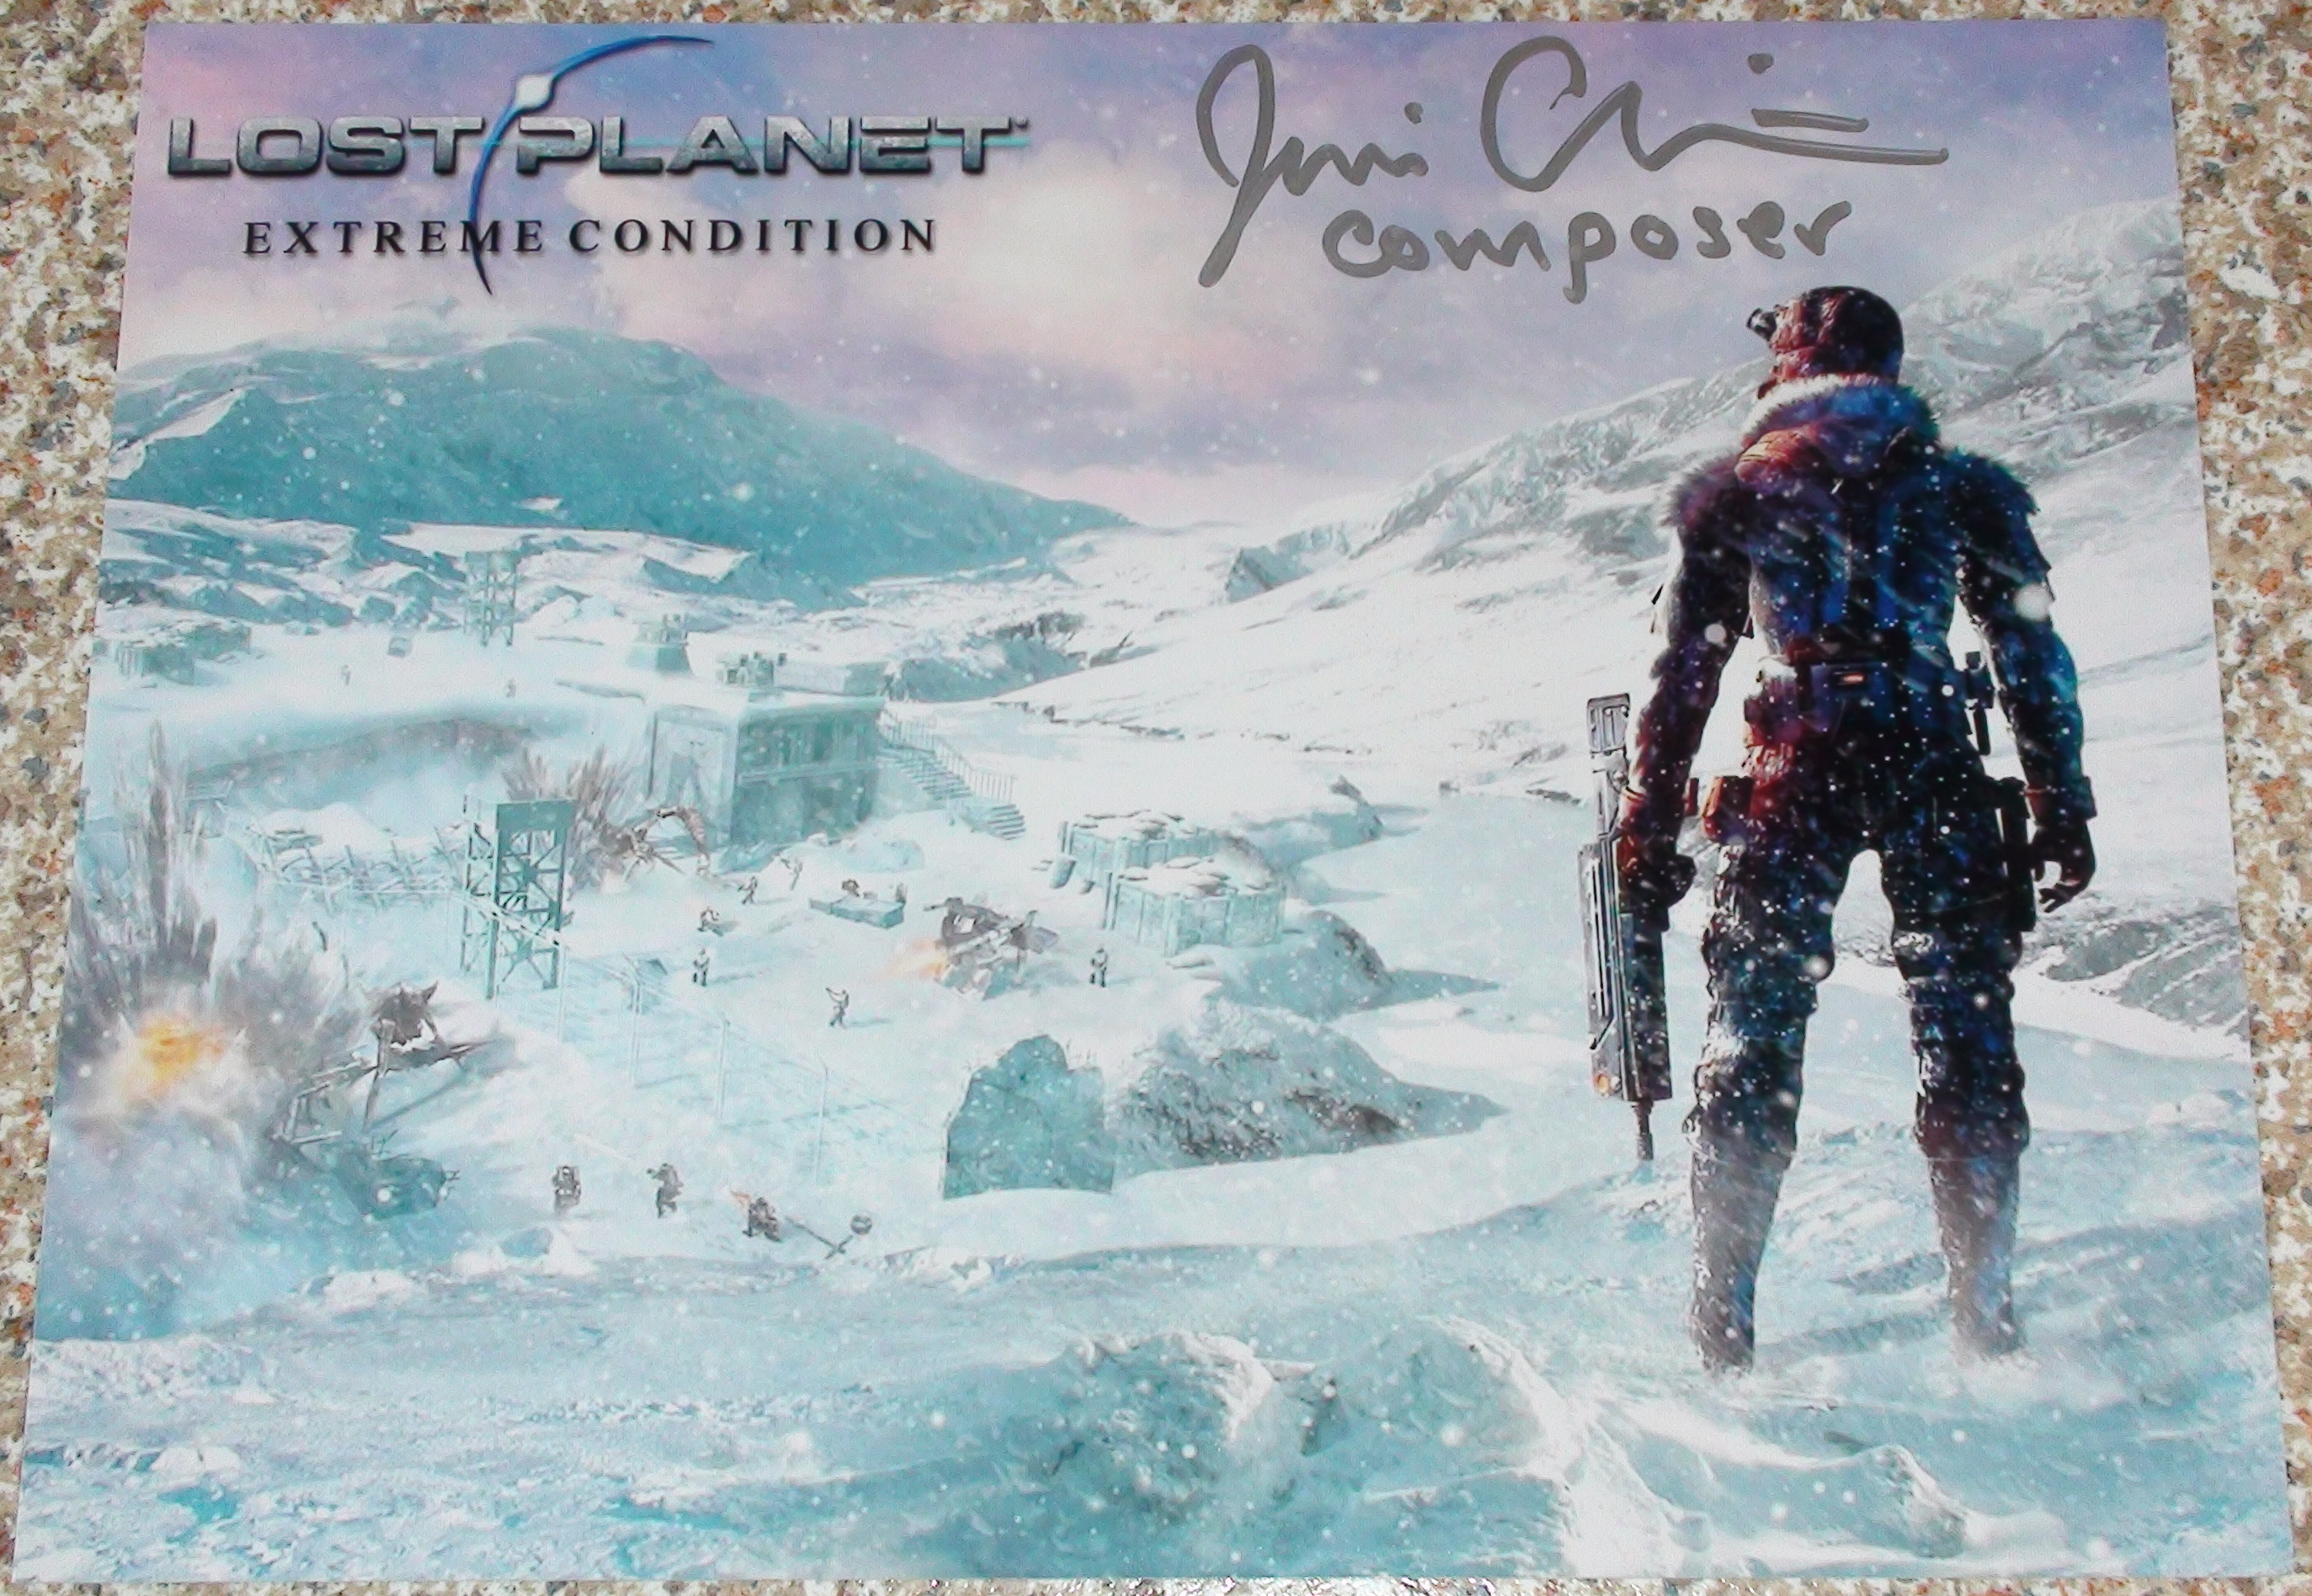 Lost Planet - Jamie Christopherson